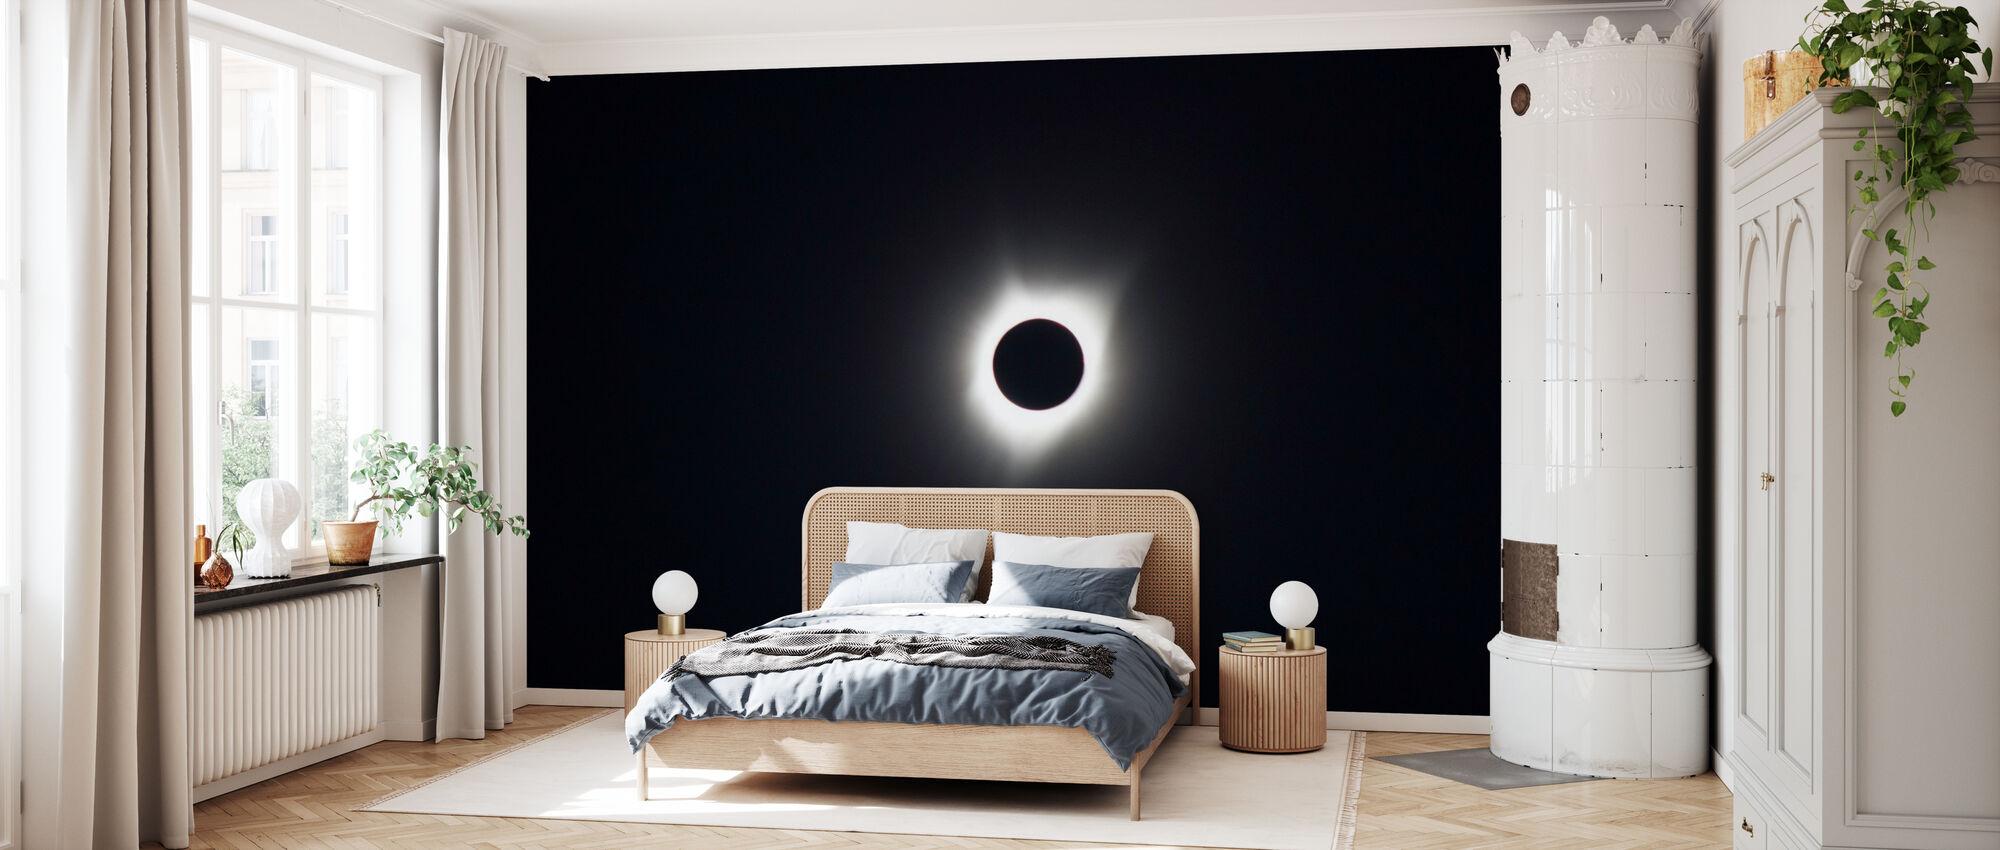 Auringonpimennys - Tapetti - Makuuhuone